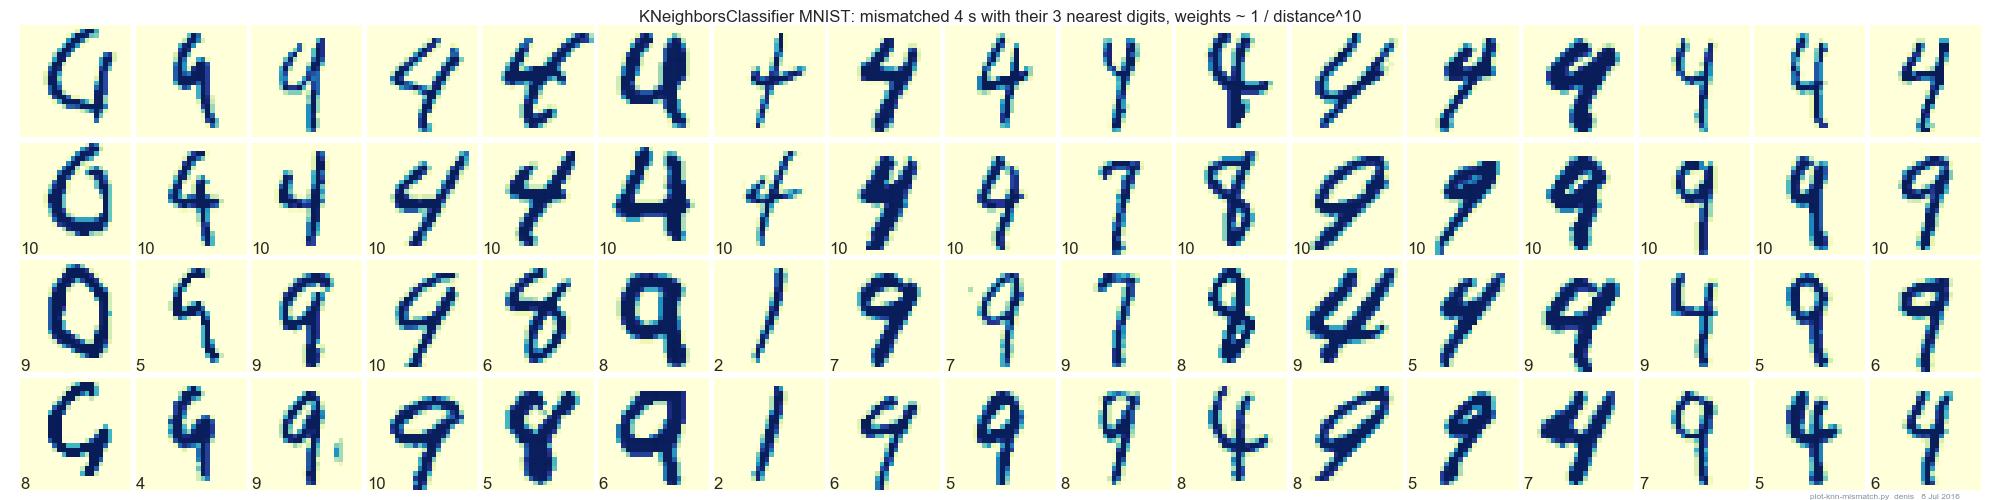 knn-mismatch-10